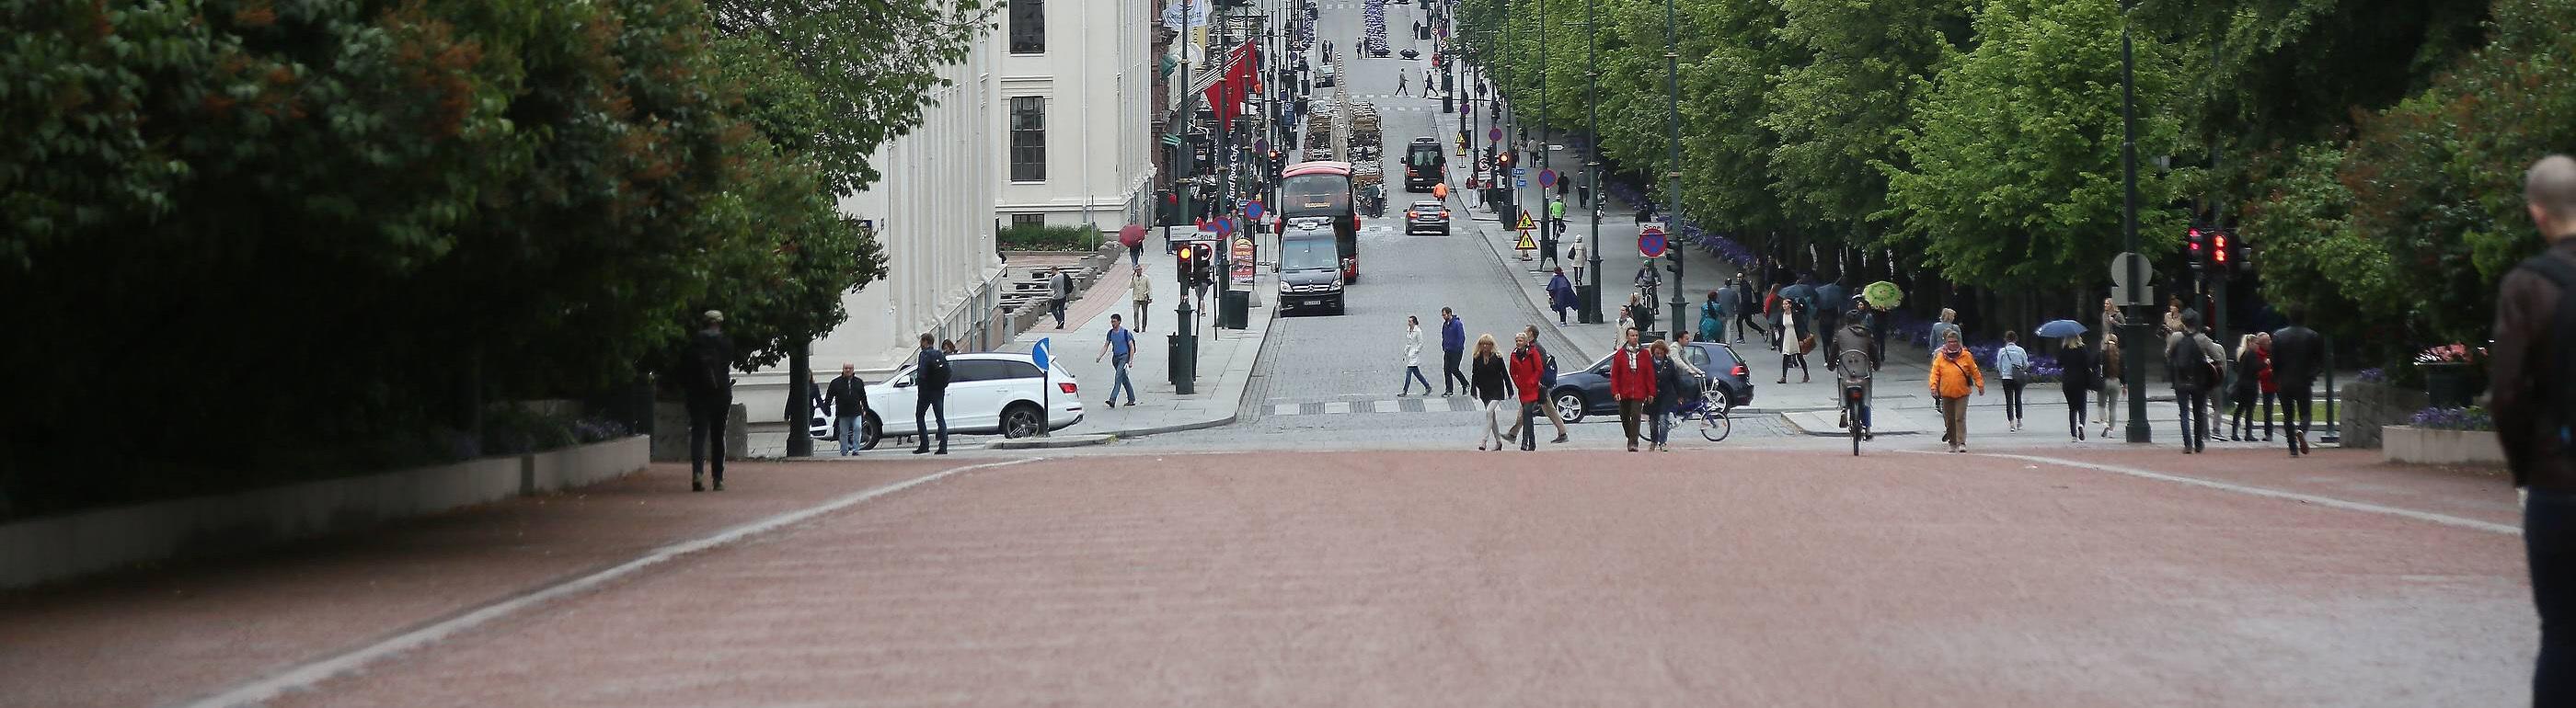 Blick vom Königsschloss in Oslo in die Innenstadt - Oslo, Norwegen